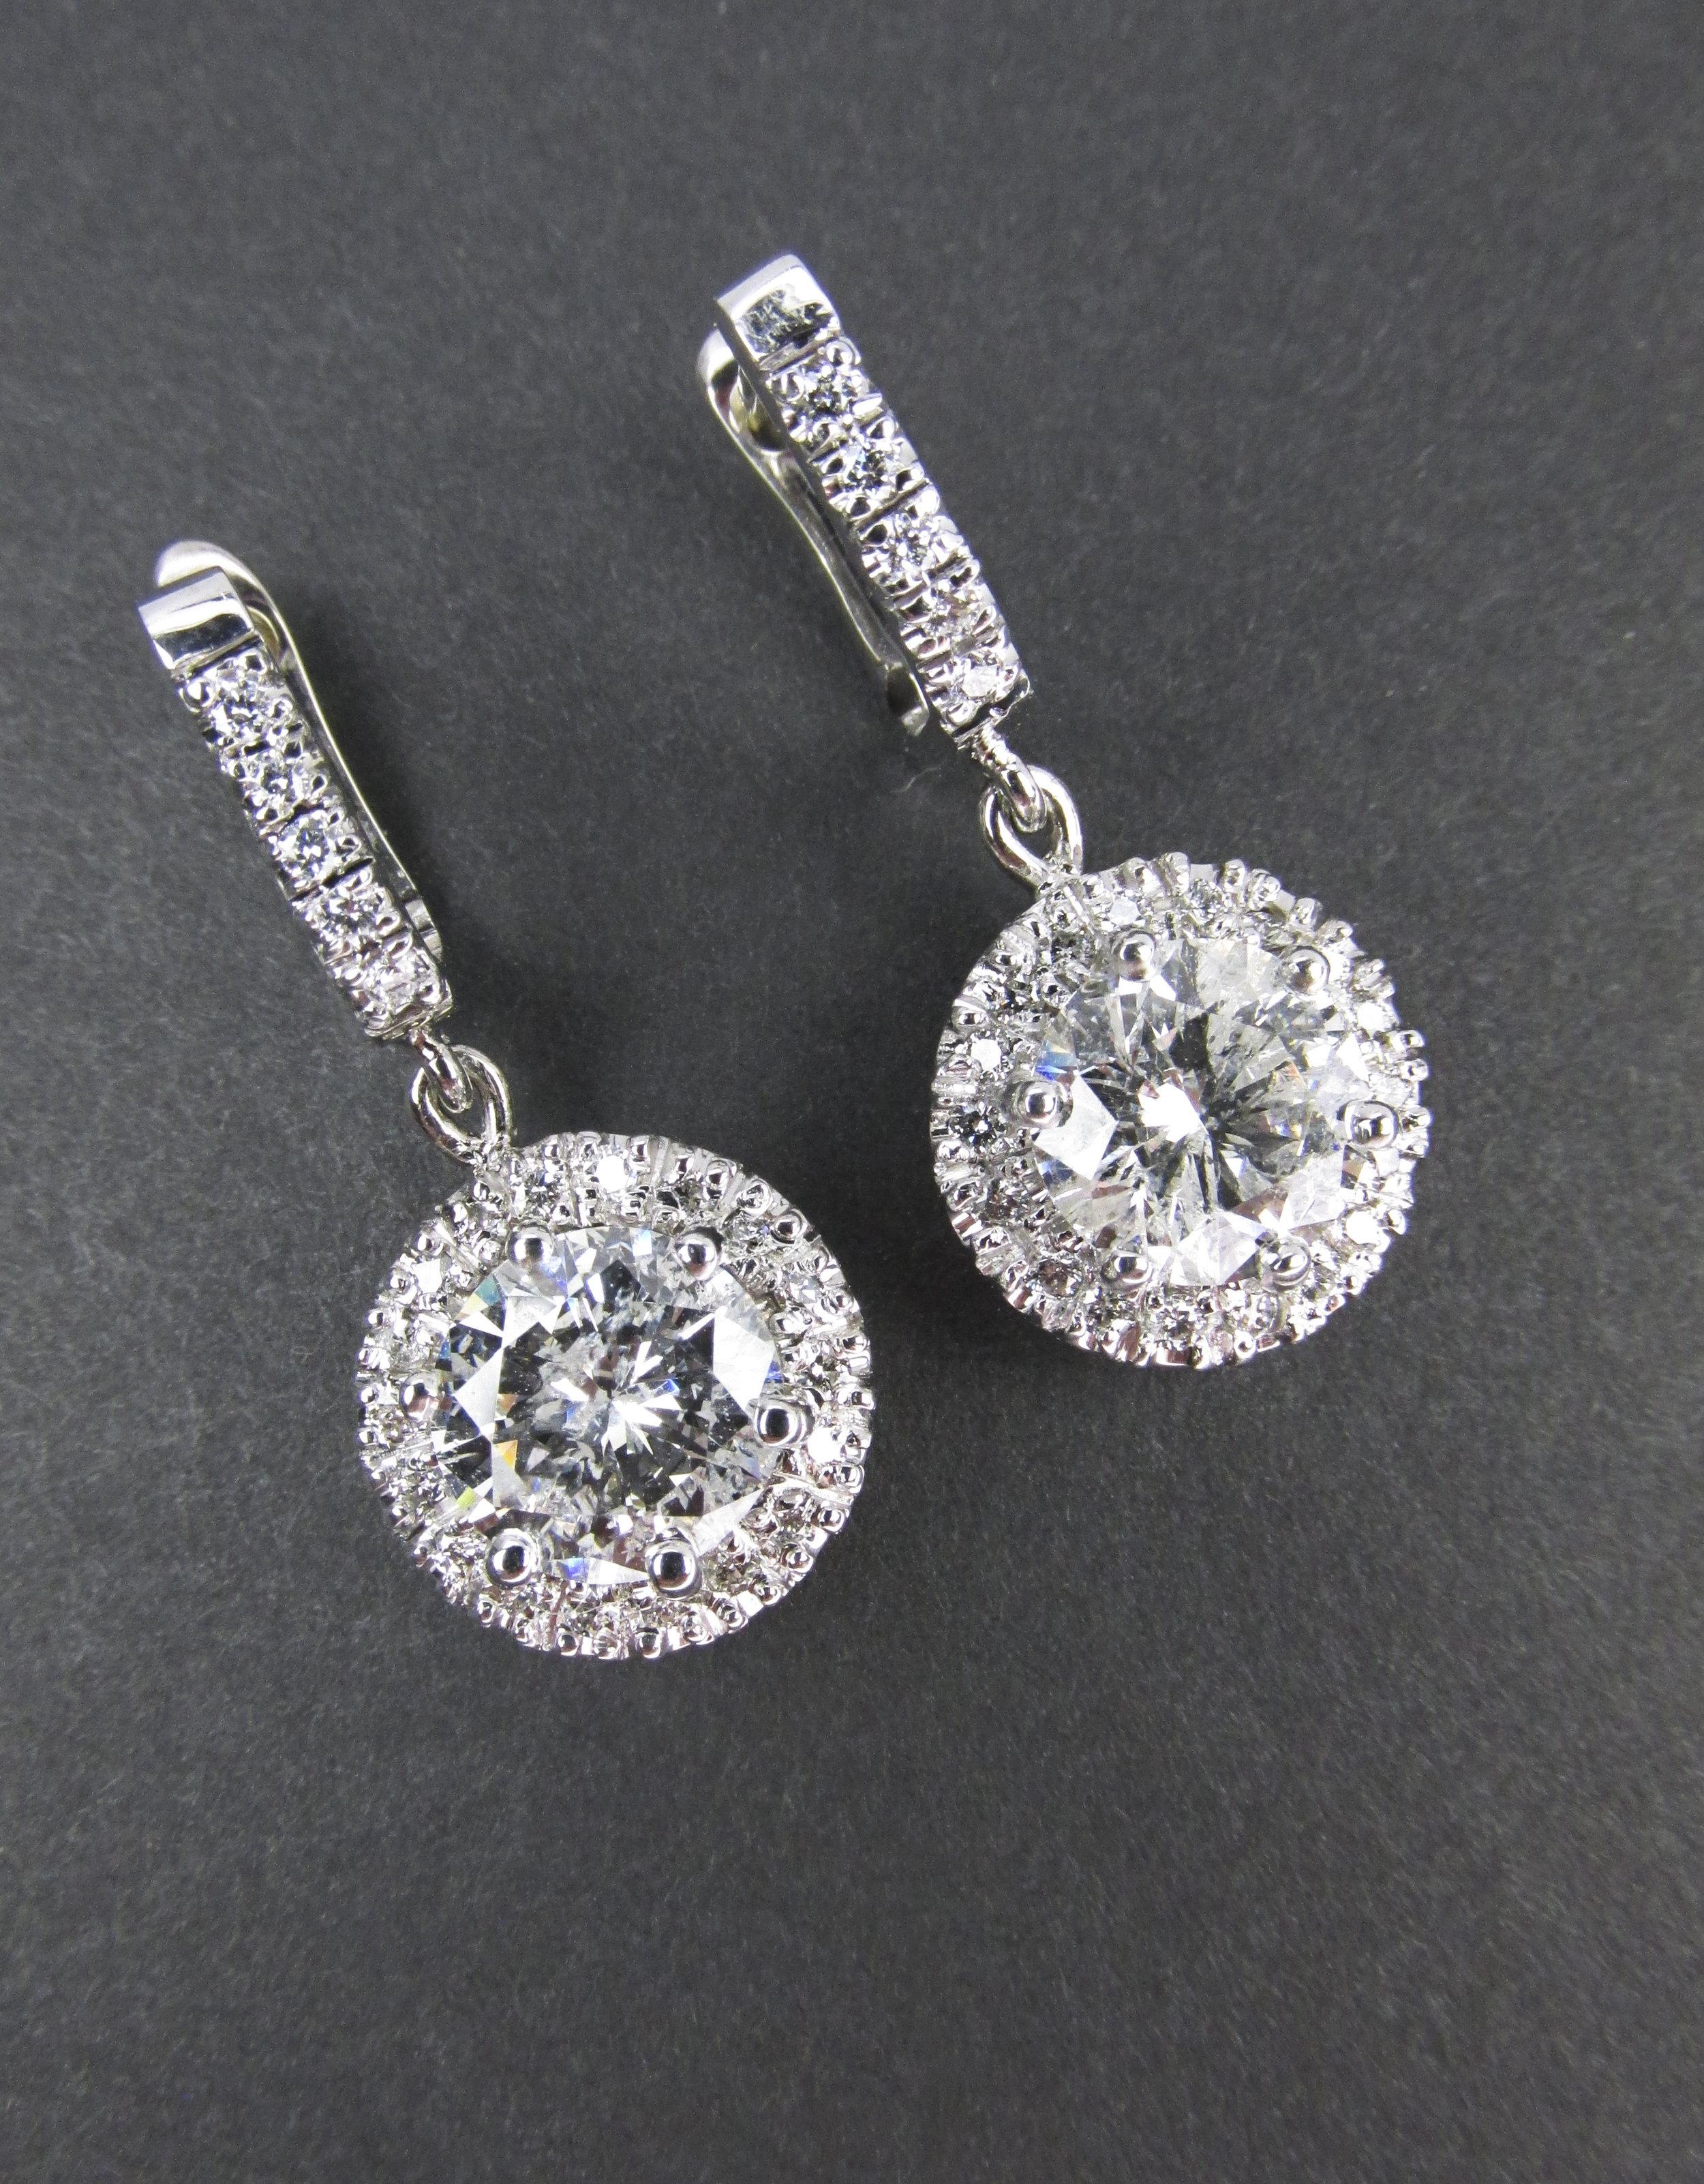 Dangle Diamond Earrings with Halos